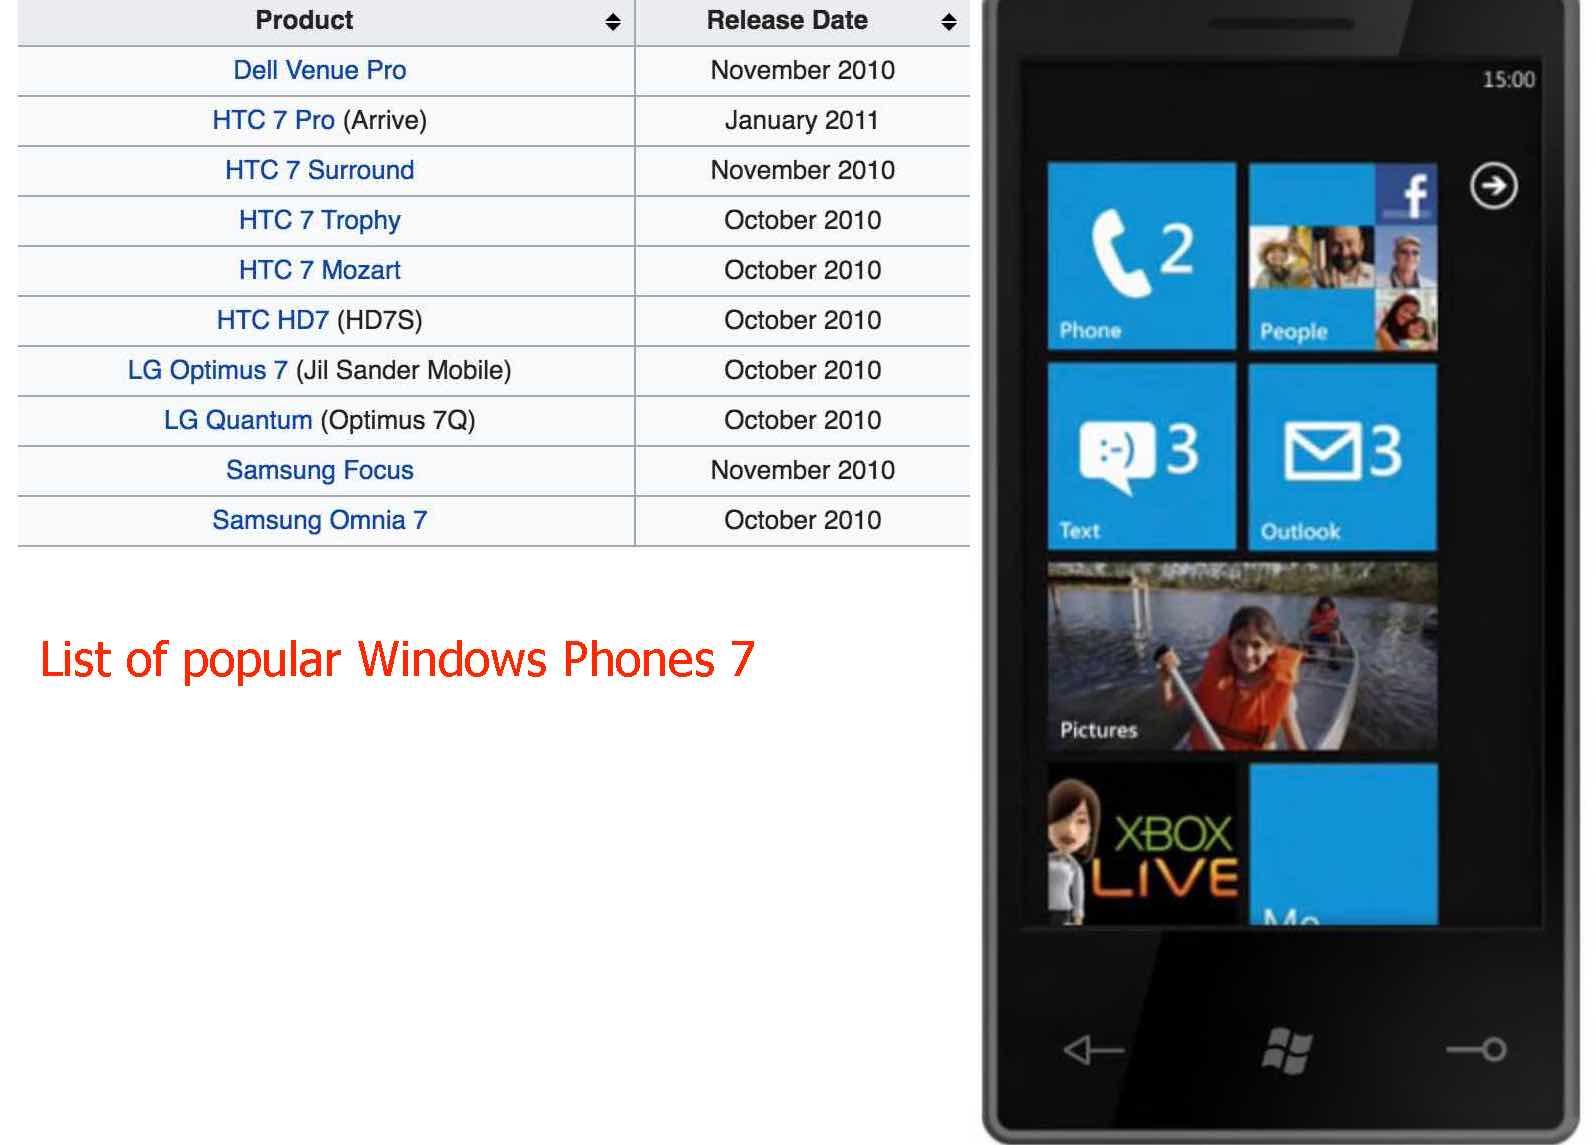 Sideload .xap Apps to windows phones 7